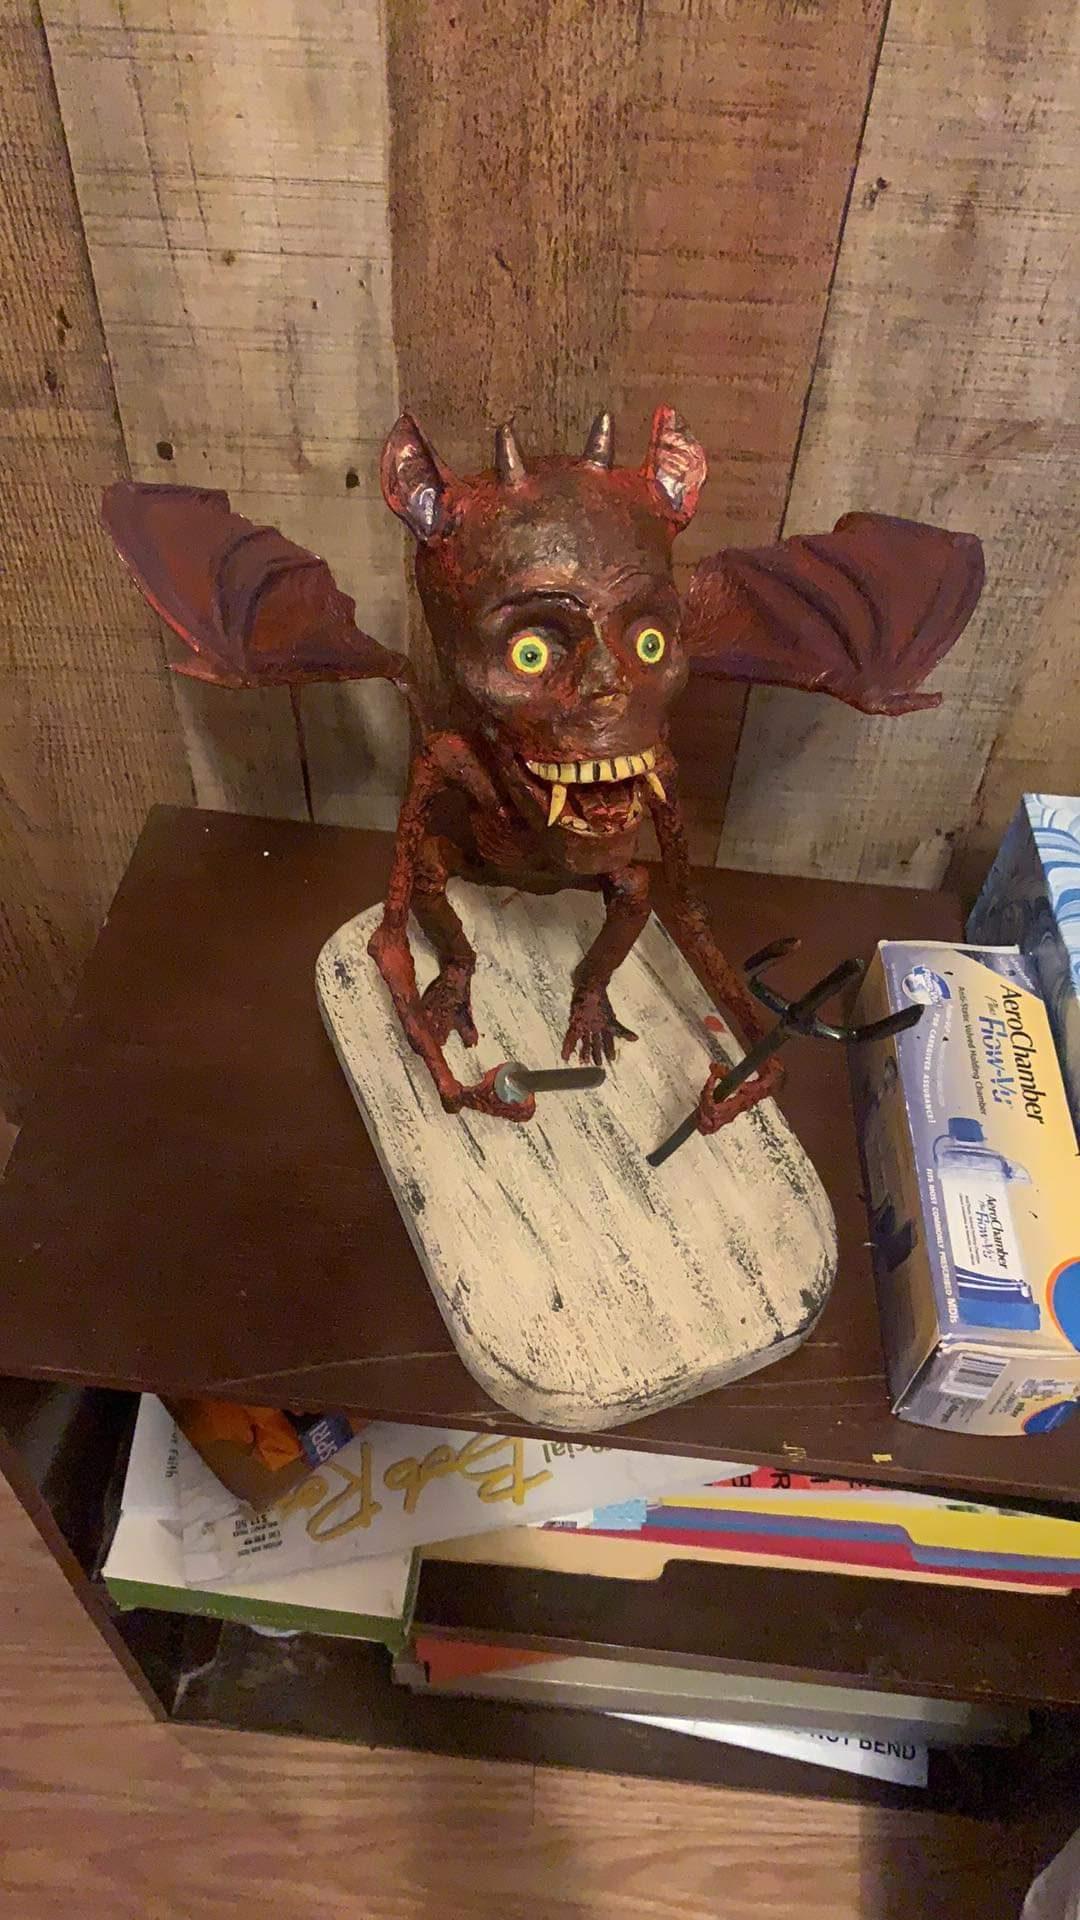 My Devil made for Halloween decor